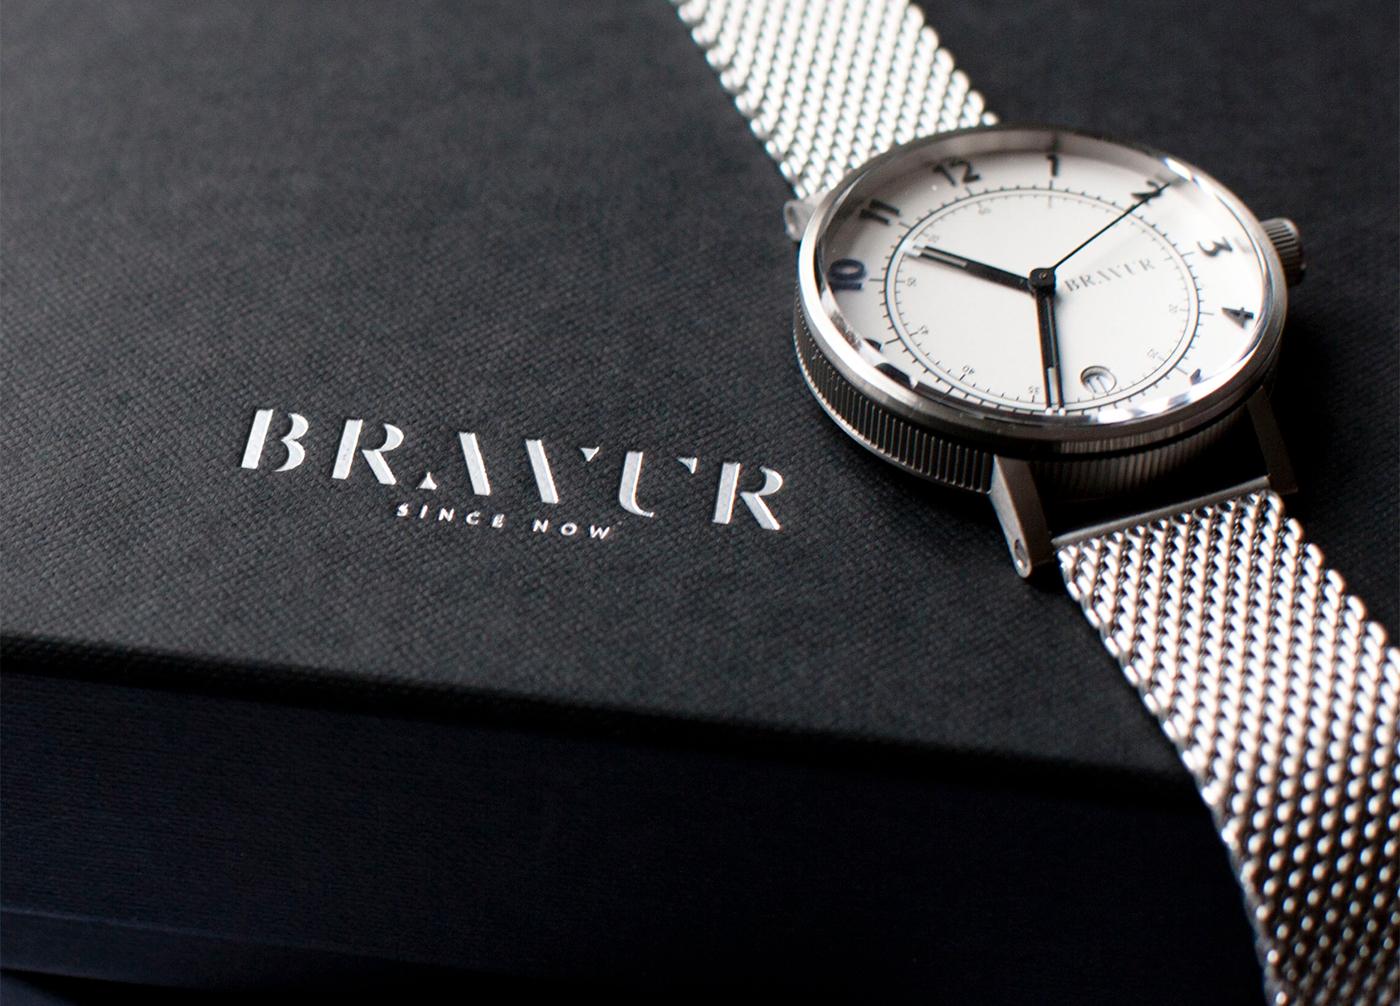 bravur watches on behance. Black Bedroom Furniture Sets. Home Design Ideas